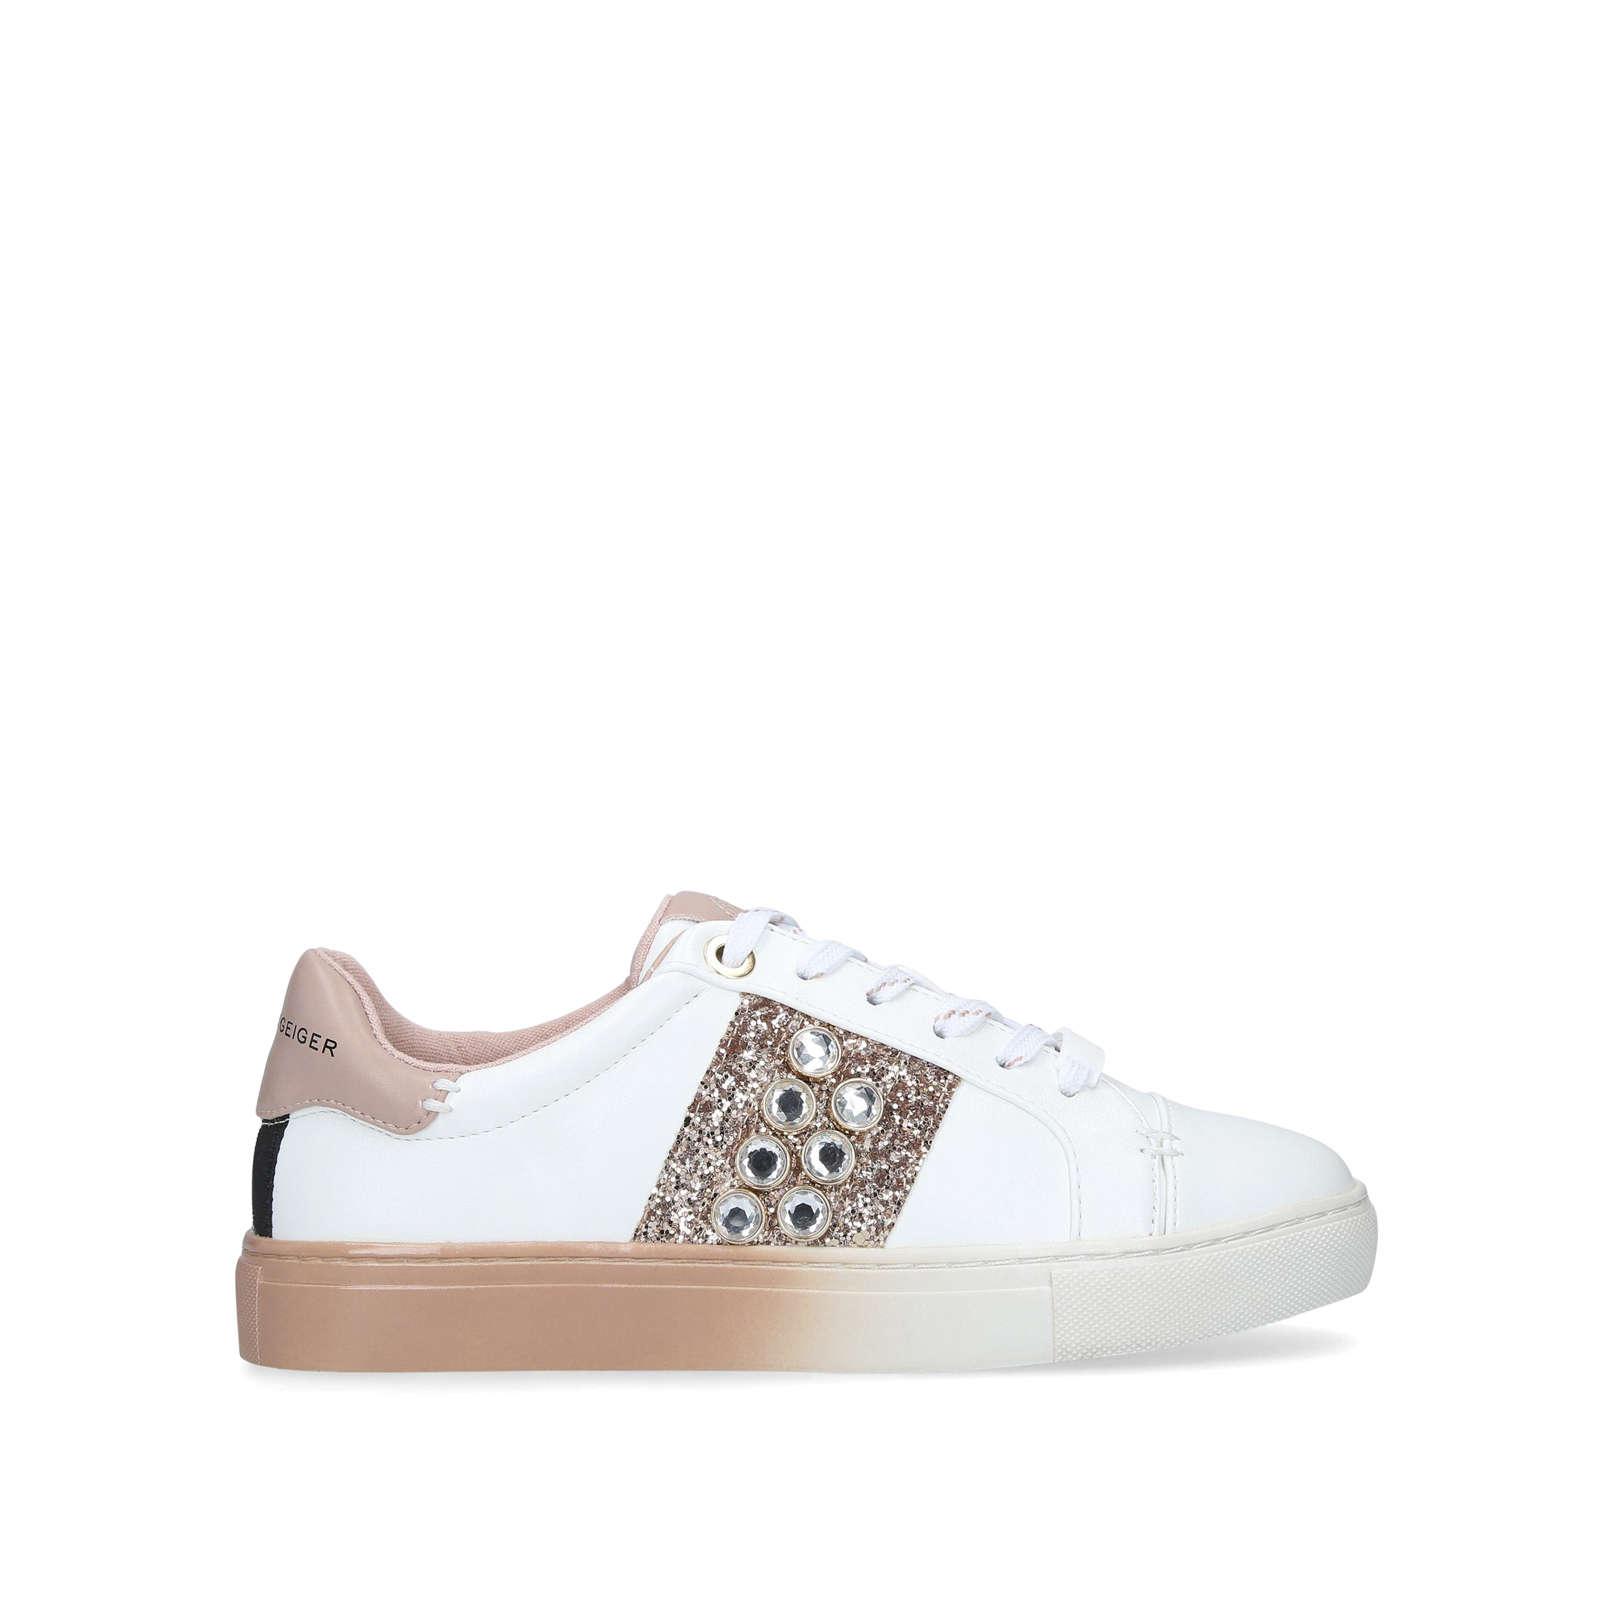 LANA - KG KURT GEIGER Sneakers